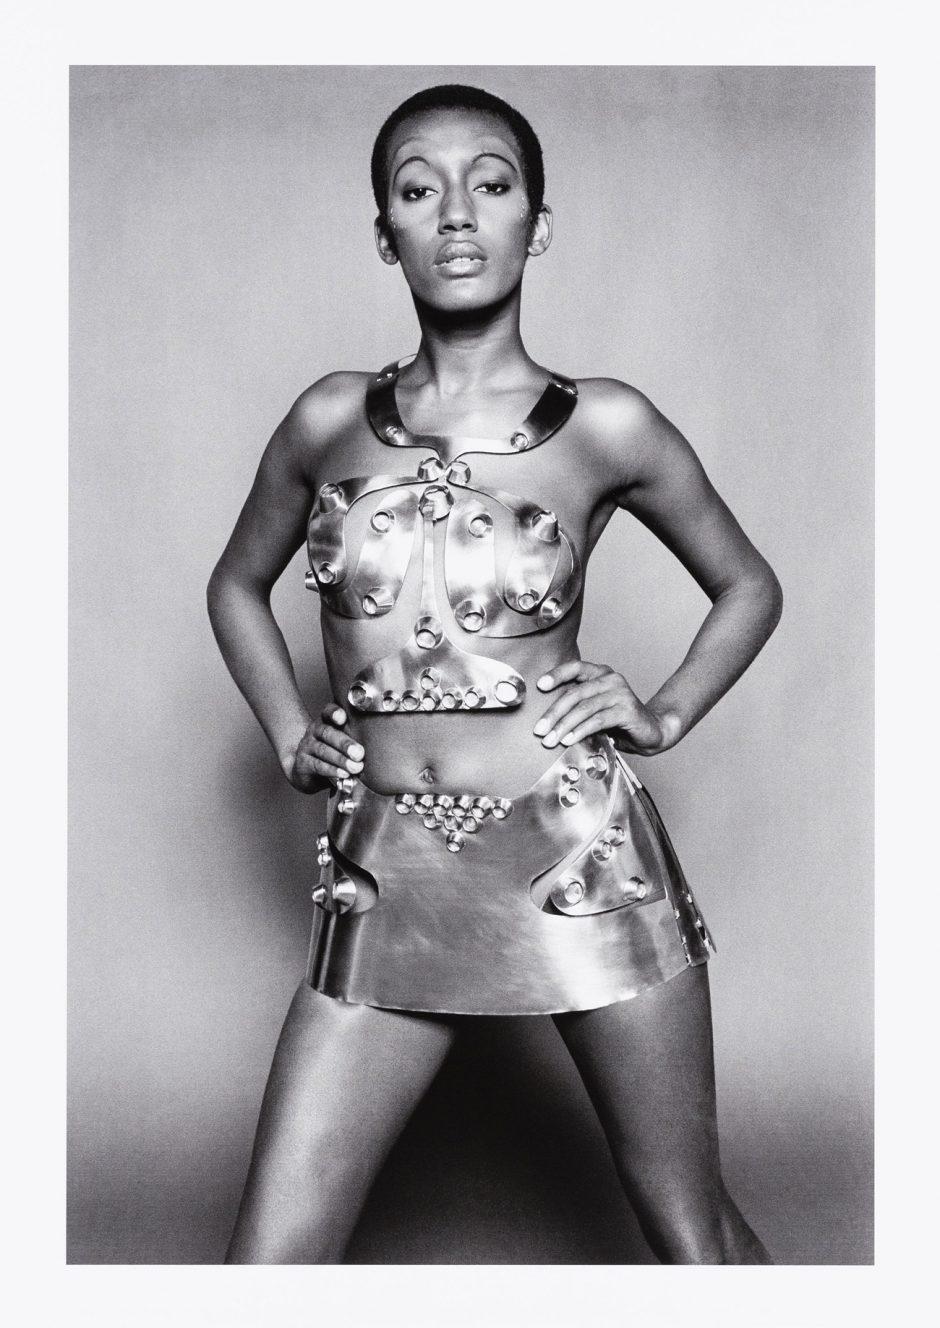 Peter Knapp (Foto), Sonja Knapp (Entwurf Metallkostüm), Grace Jones pour Ungaro, Modekampagne Body Sculptures, 1969, Modern Print: 2016, Museum für Gestaltung Zürich, Grafiksammlung